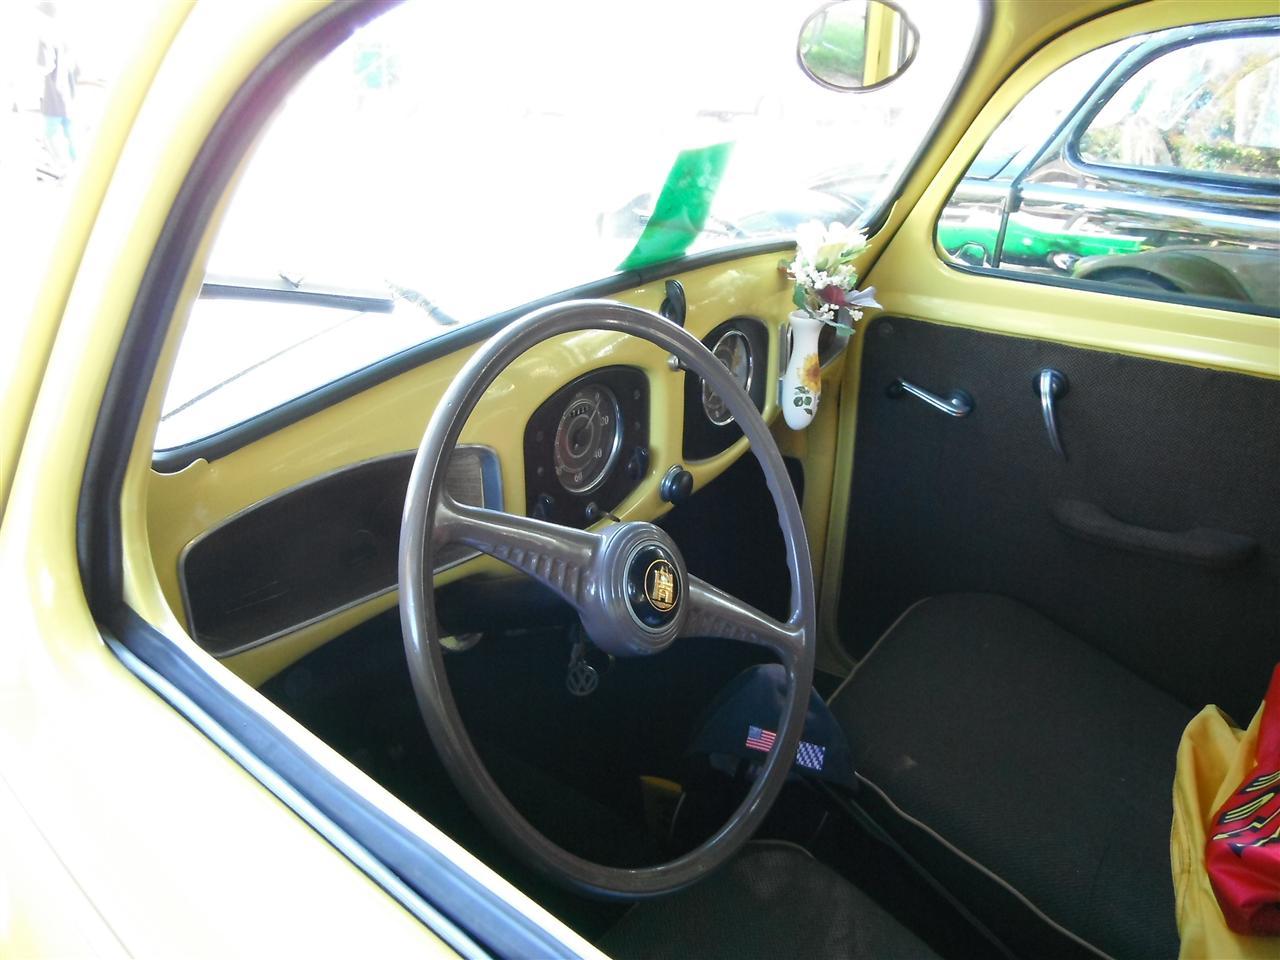 Yellow Split-Window Beetle with mail logos